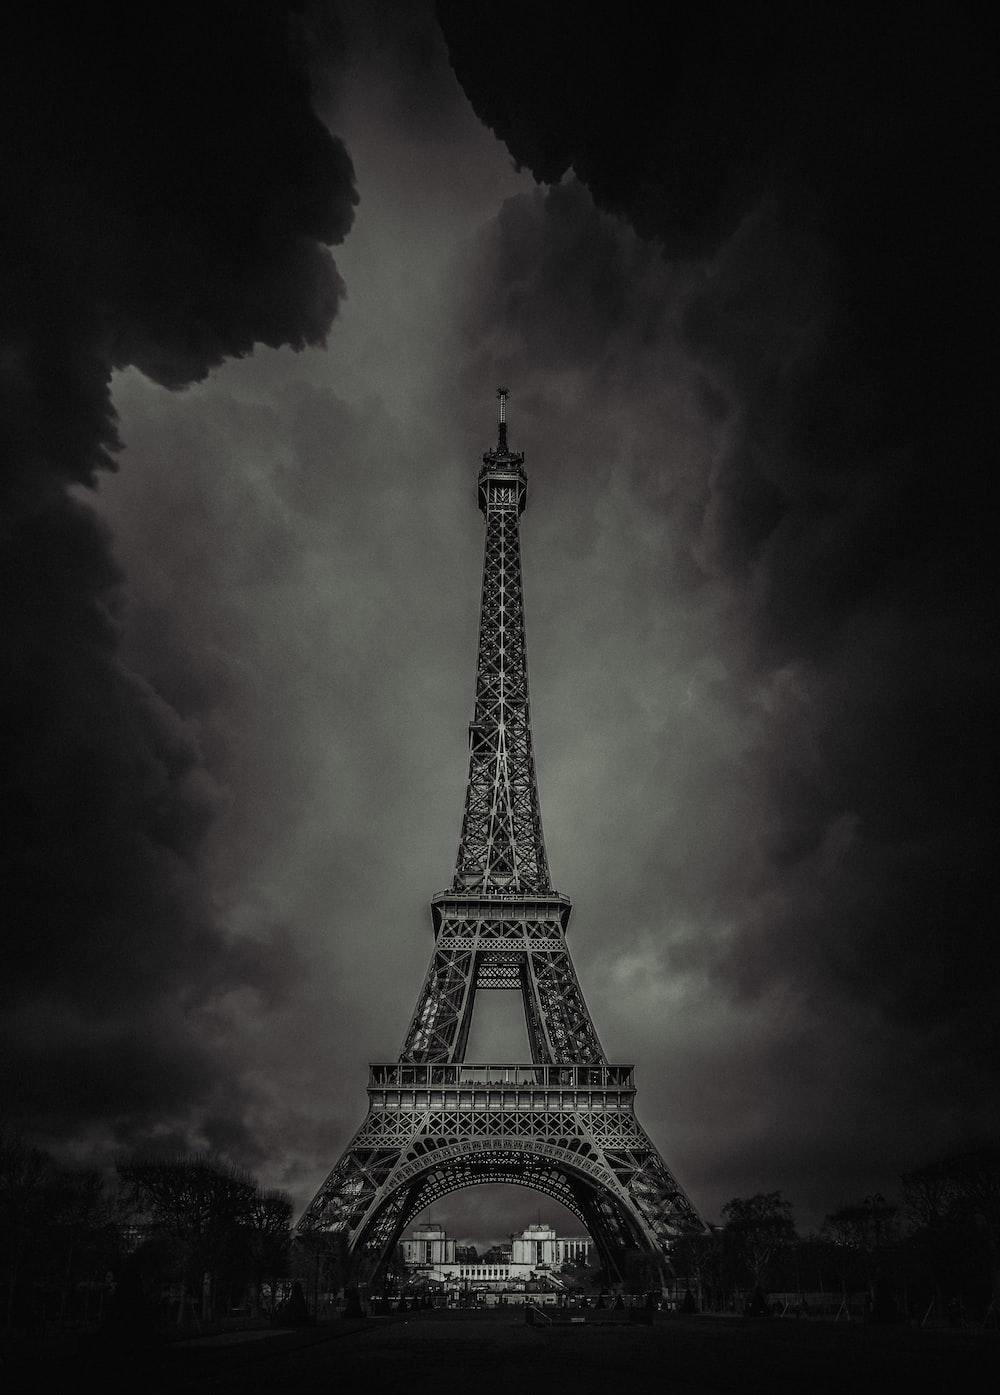 Eiffel Tower, Paris low light photography